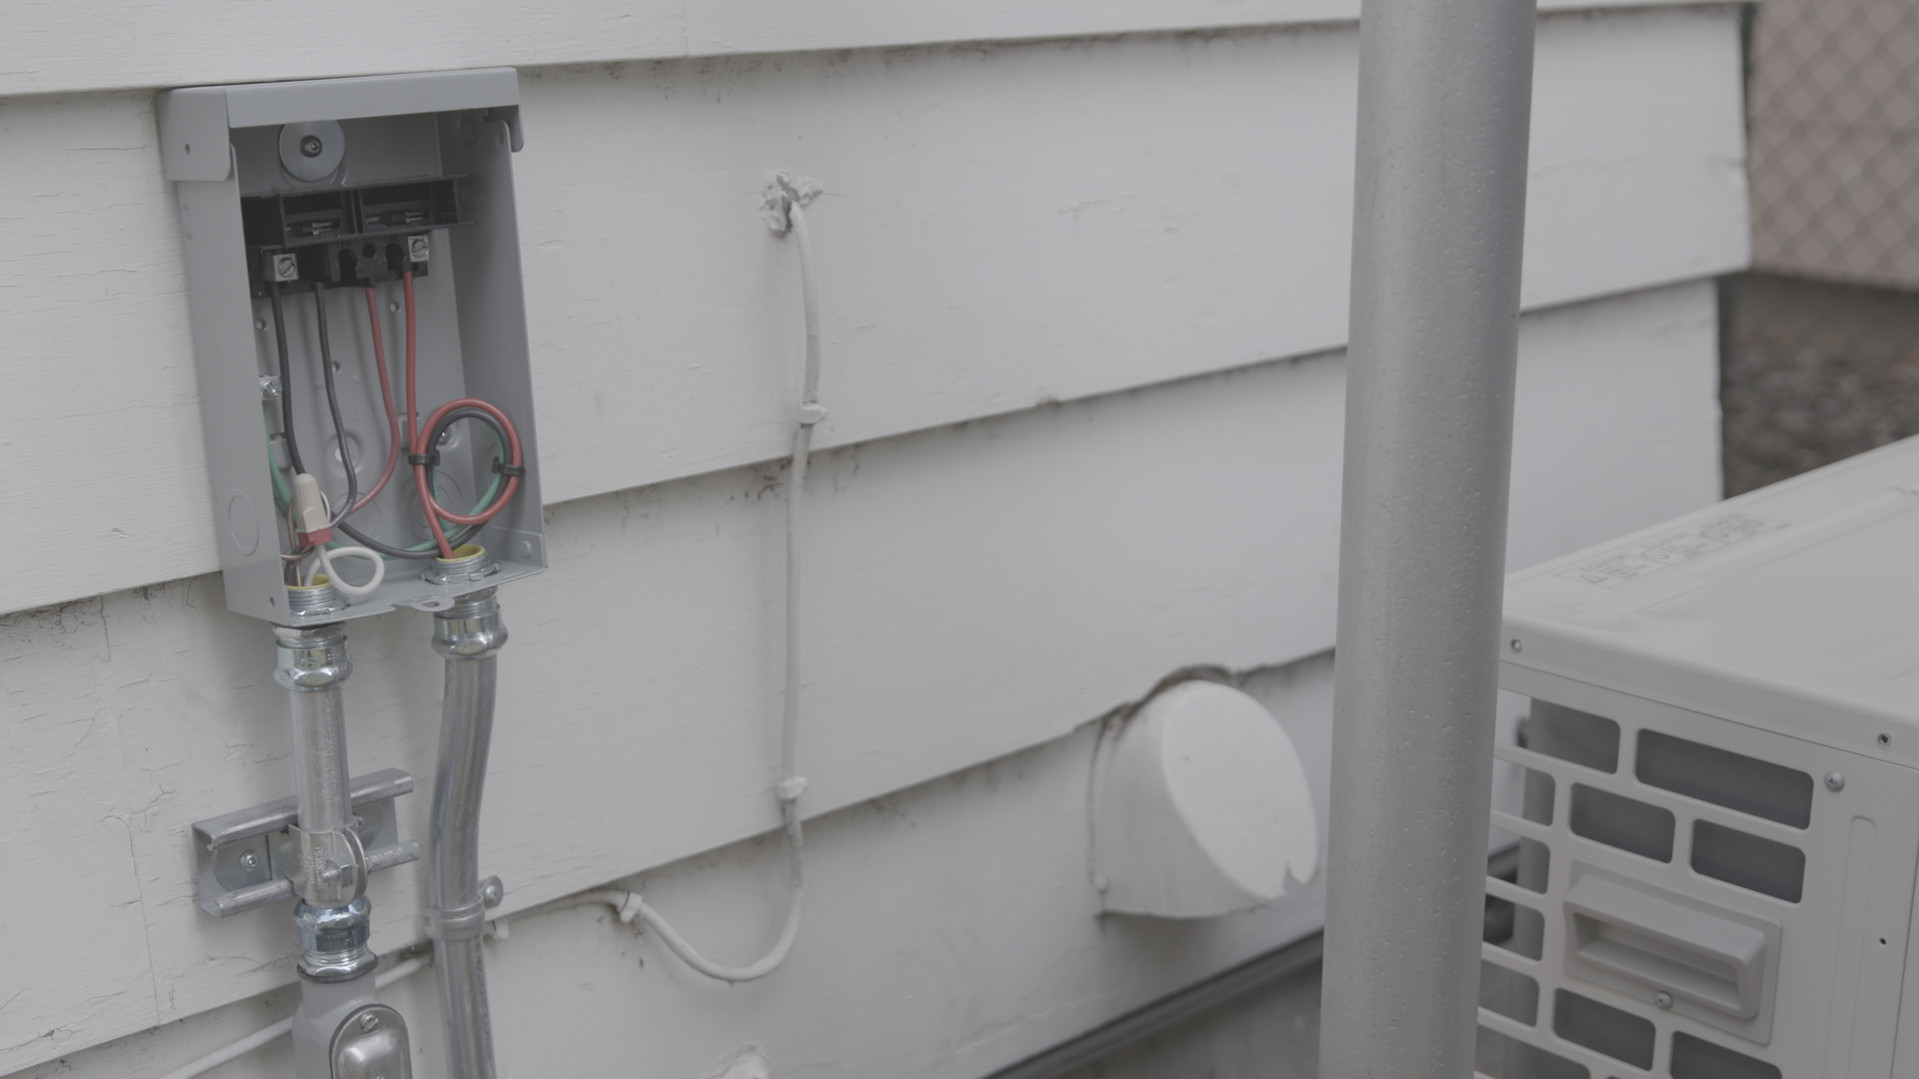 House Wiring.jpg